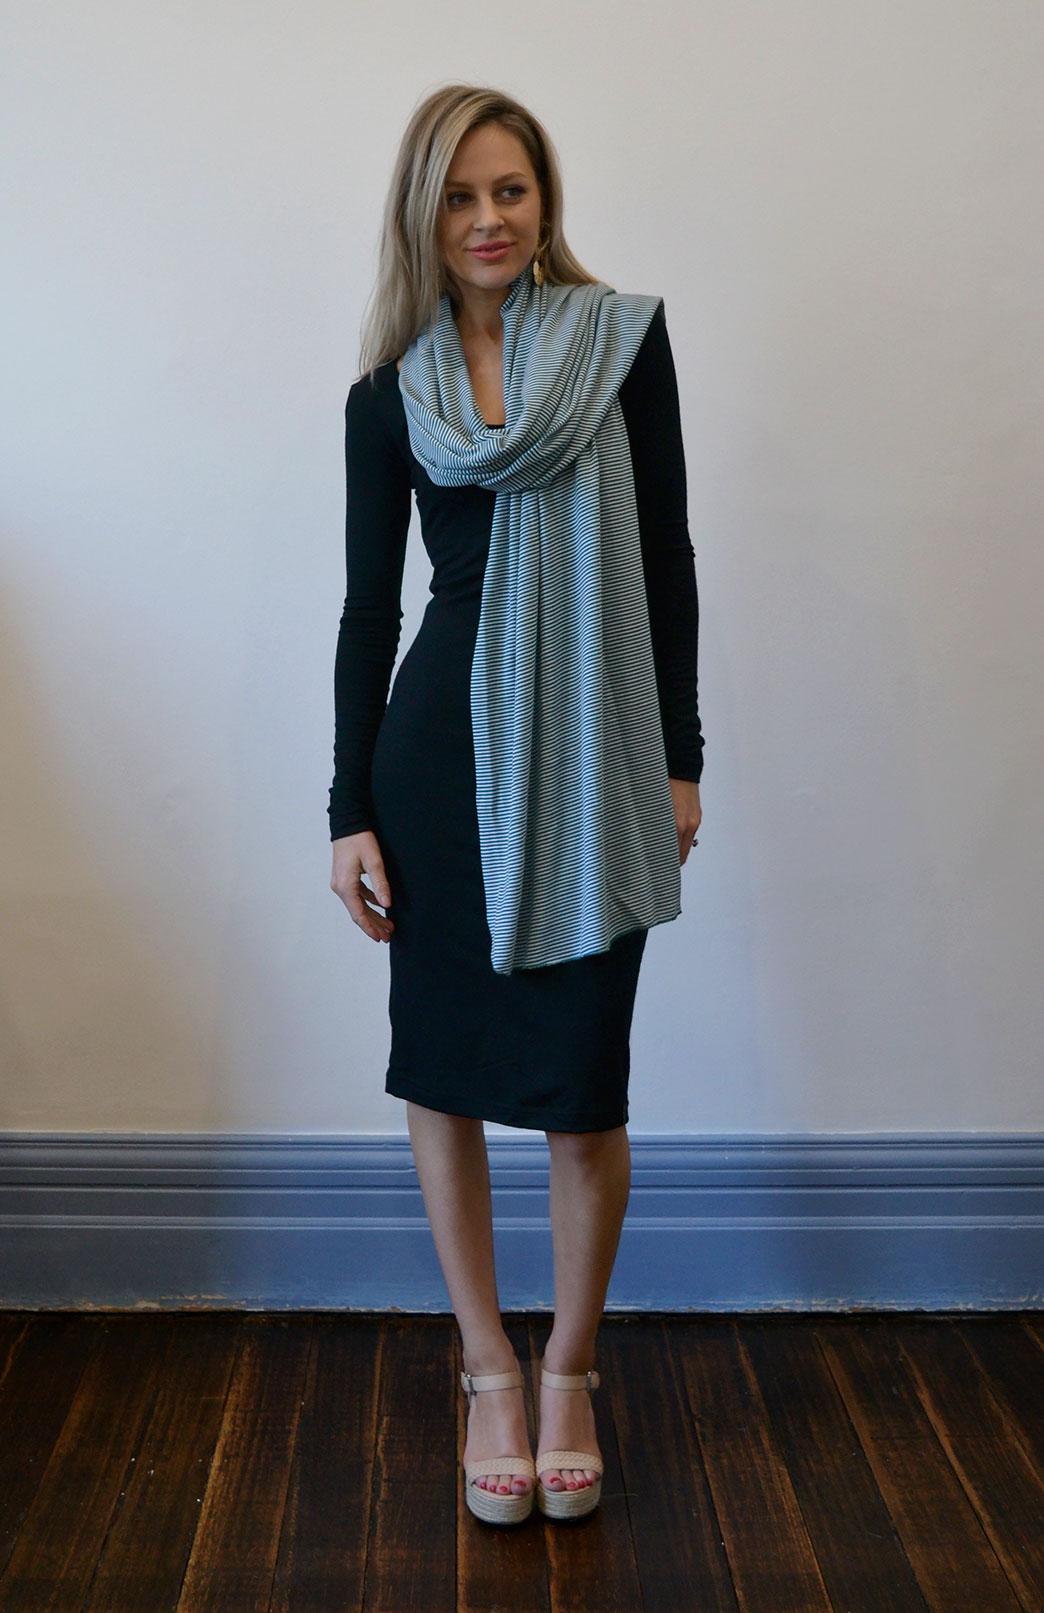 Scarves - Patterned - Women's Superfine Merino Wool Classic Wide Scarf - Smitten Merino Tasmania Australia